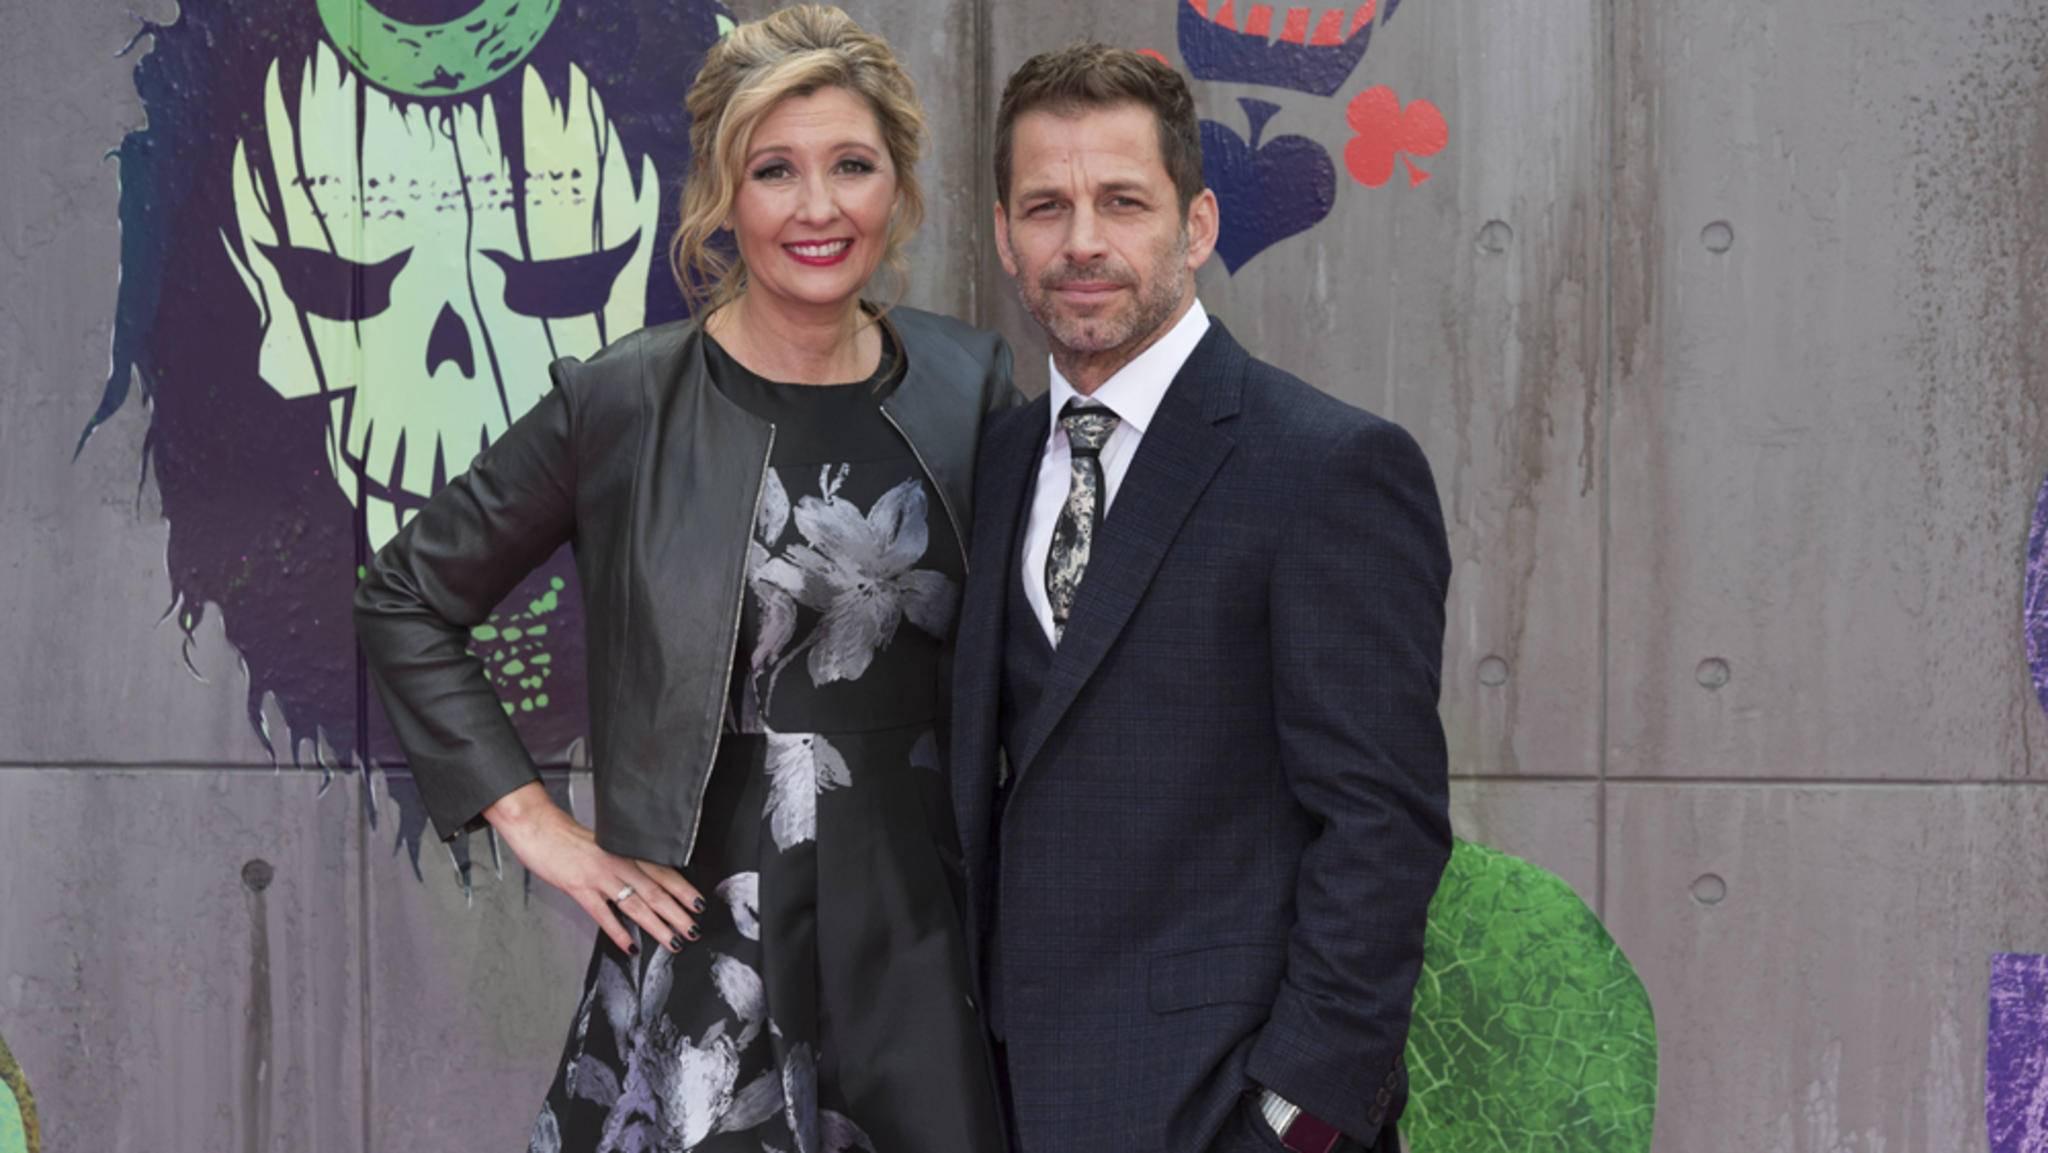 Regisseur Zack Snyder mit Ehefrau Deborah